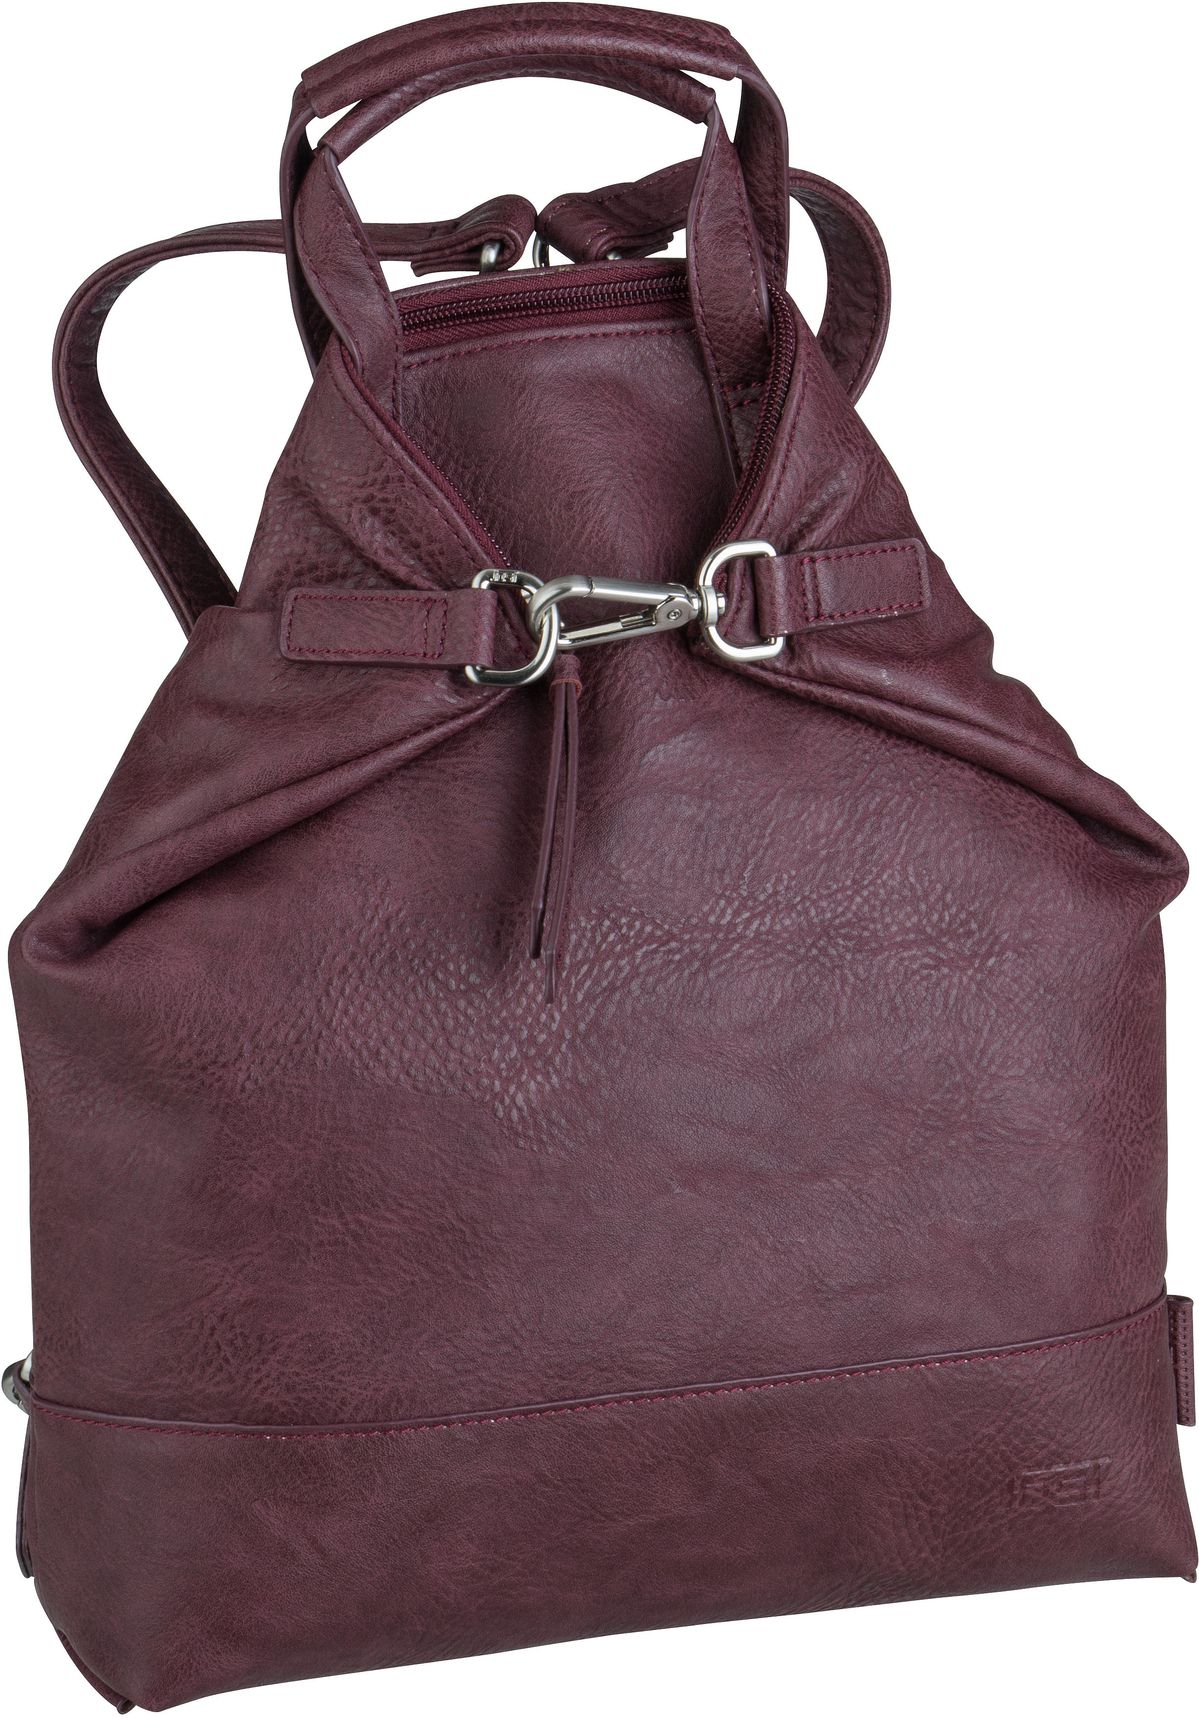 Rucksack / Daypack Merritt 2670 X-Change 3in1 Bag XS Bordeaux